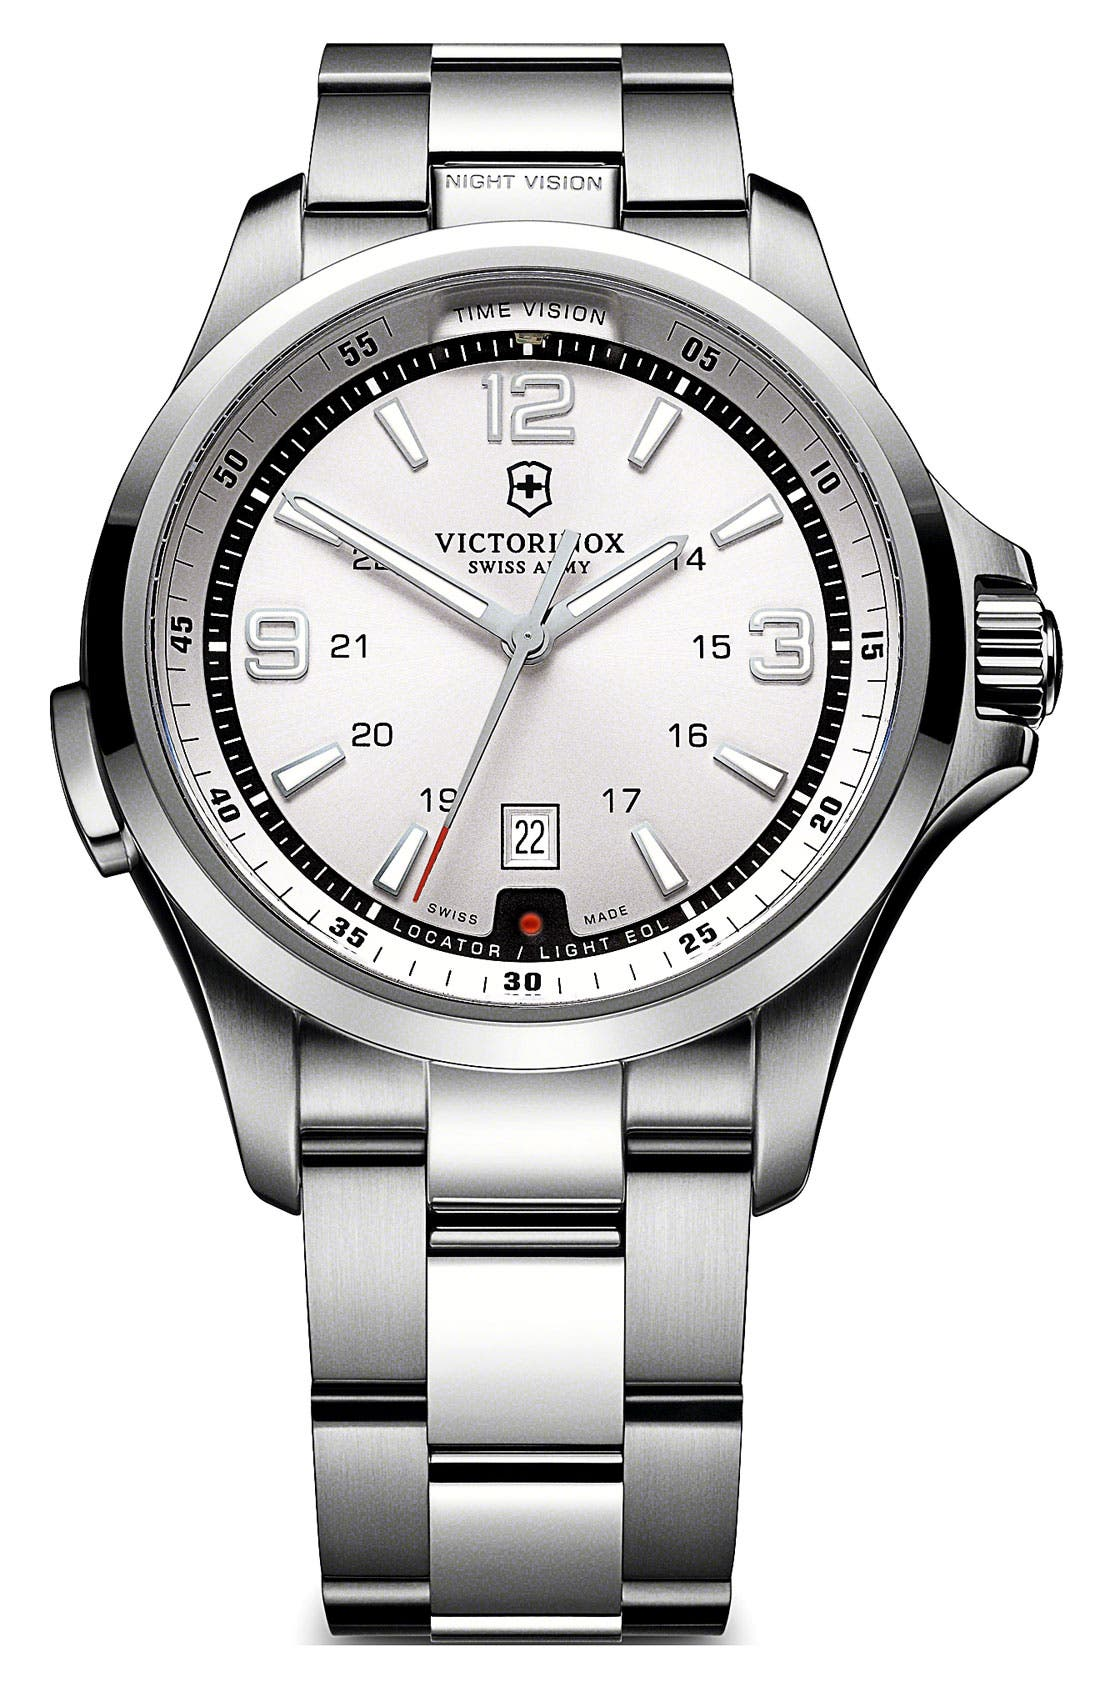 Main Image - Victorinox Swiss Army® 'Night Vision' Bracelet Watch, 42mm